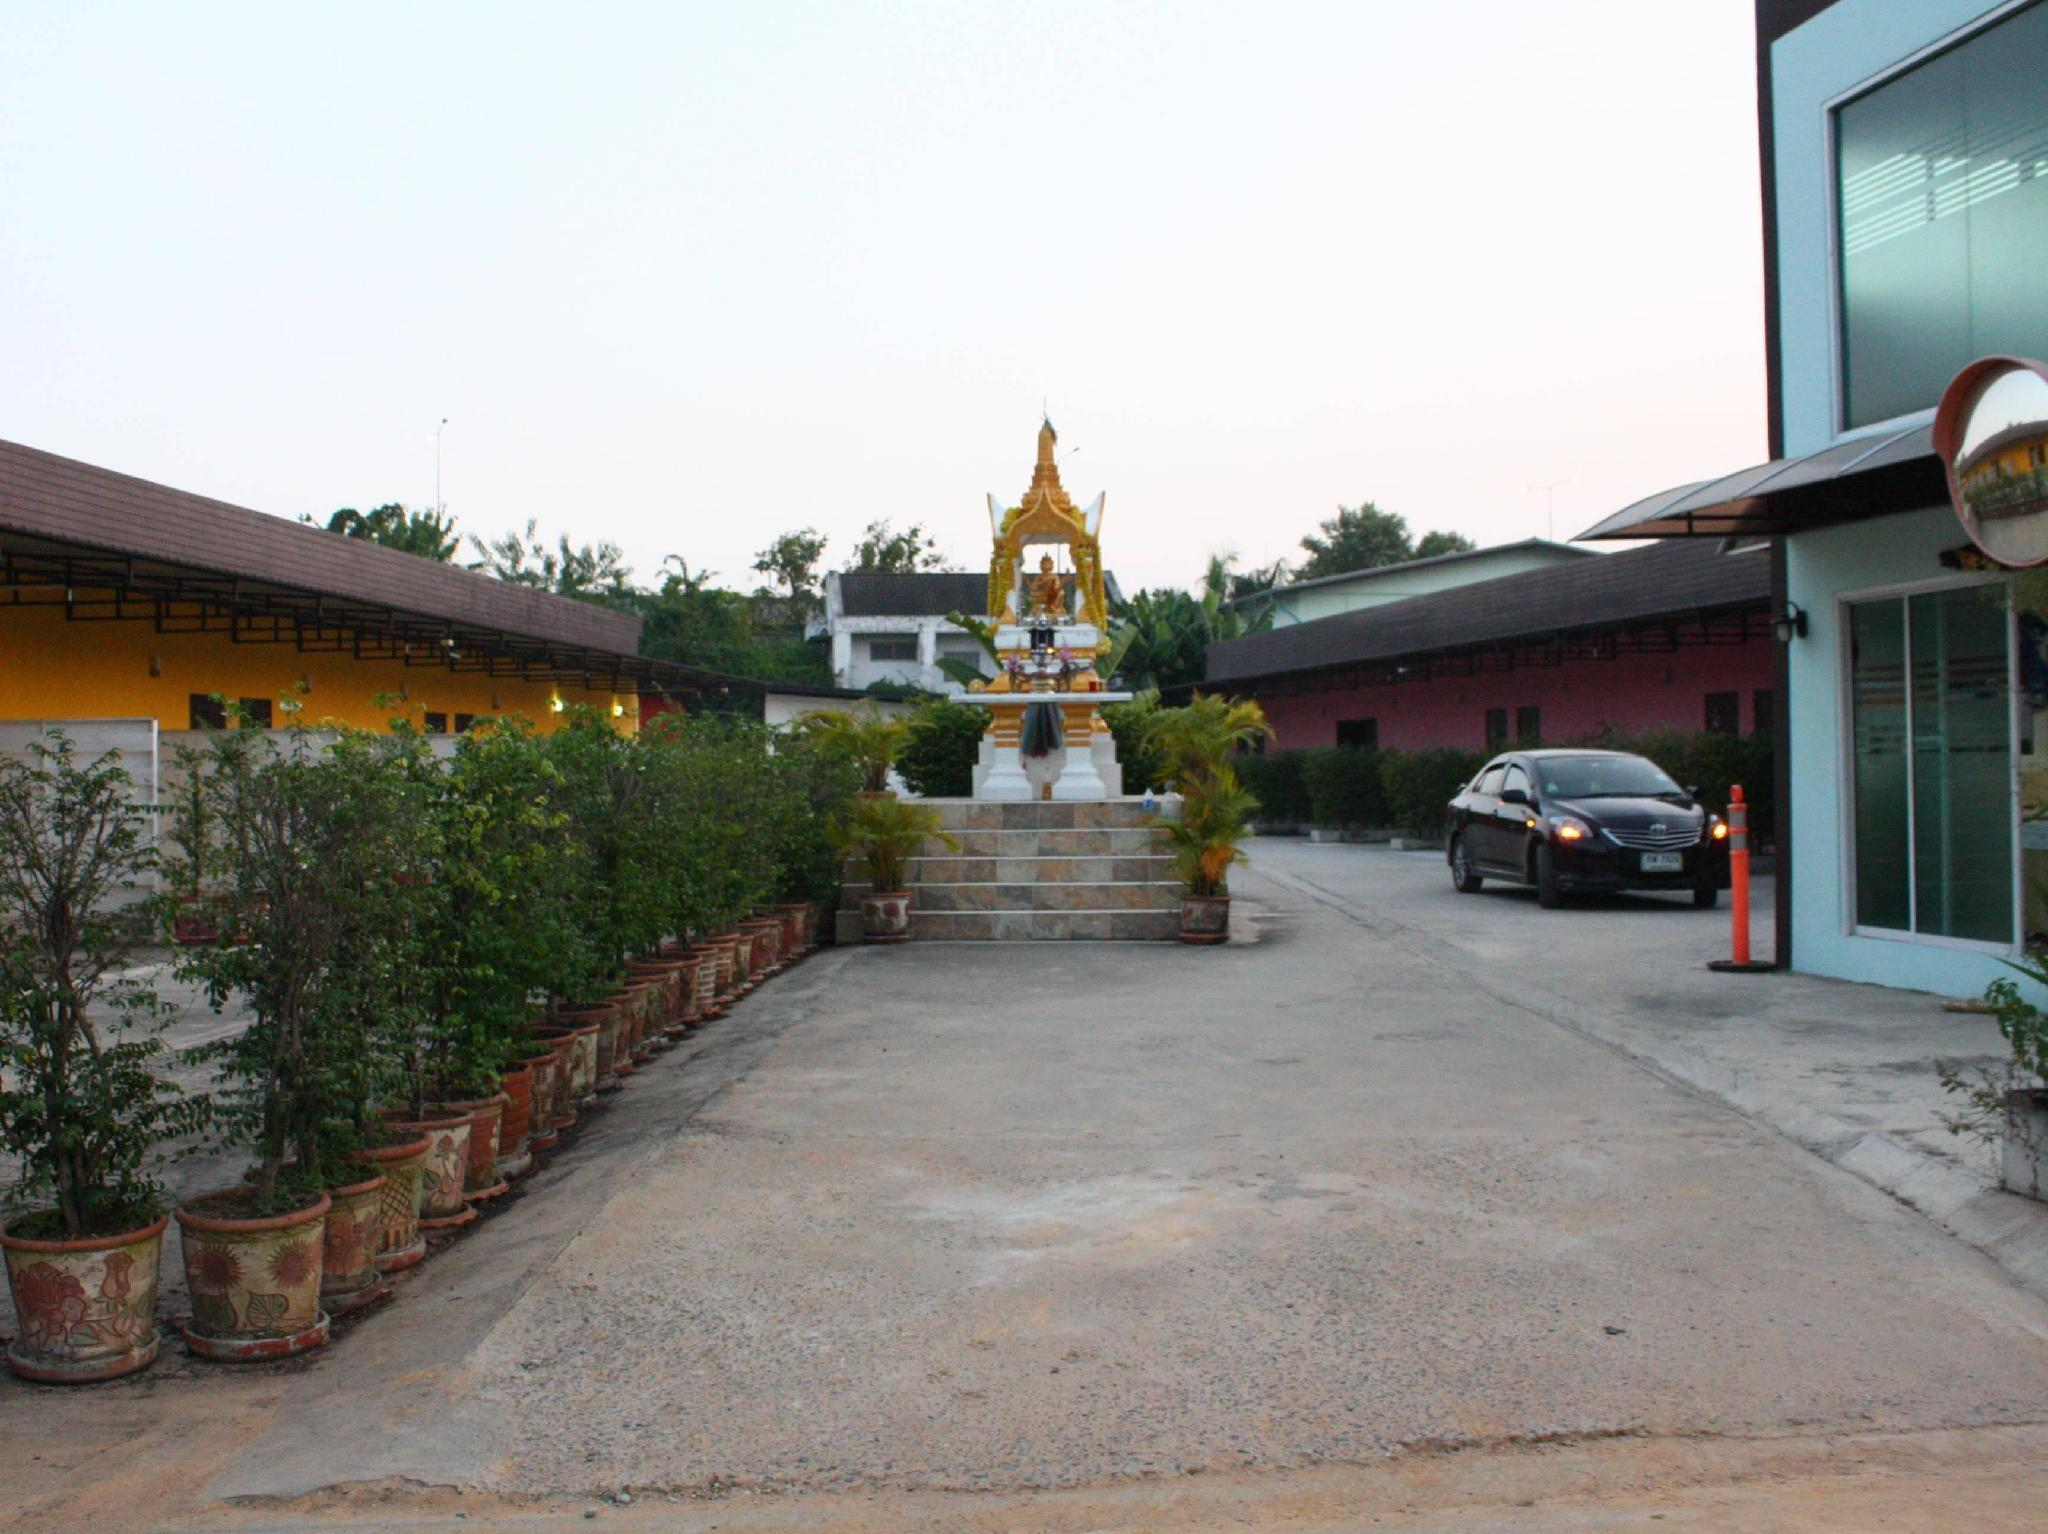 Pichaya Resort 2, Sai Mai